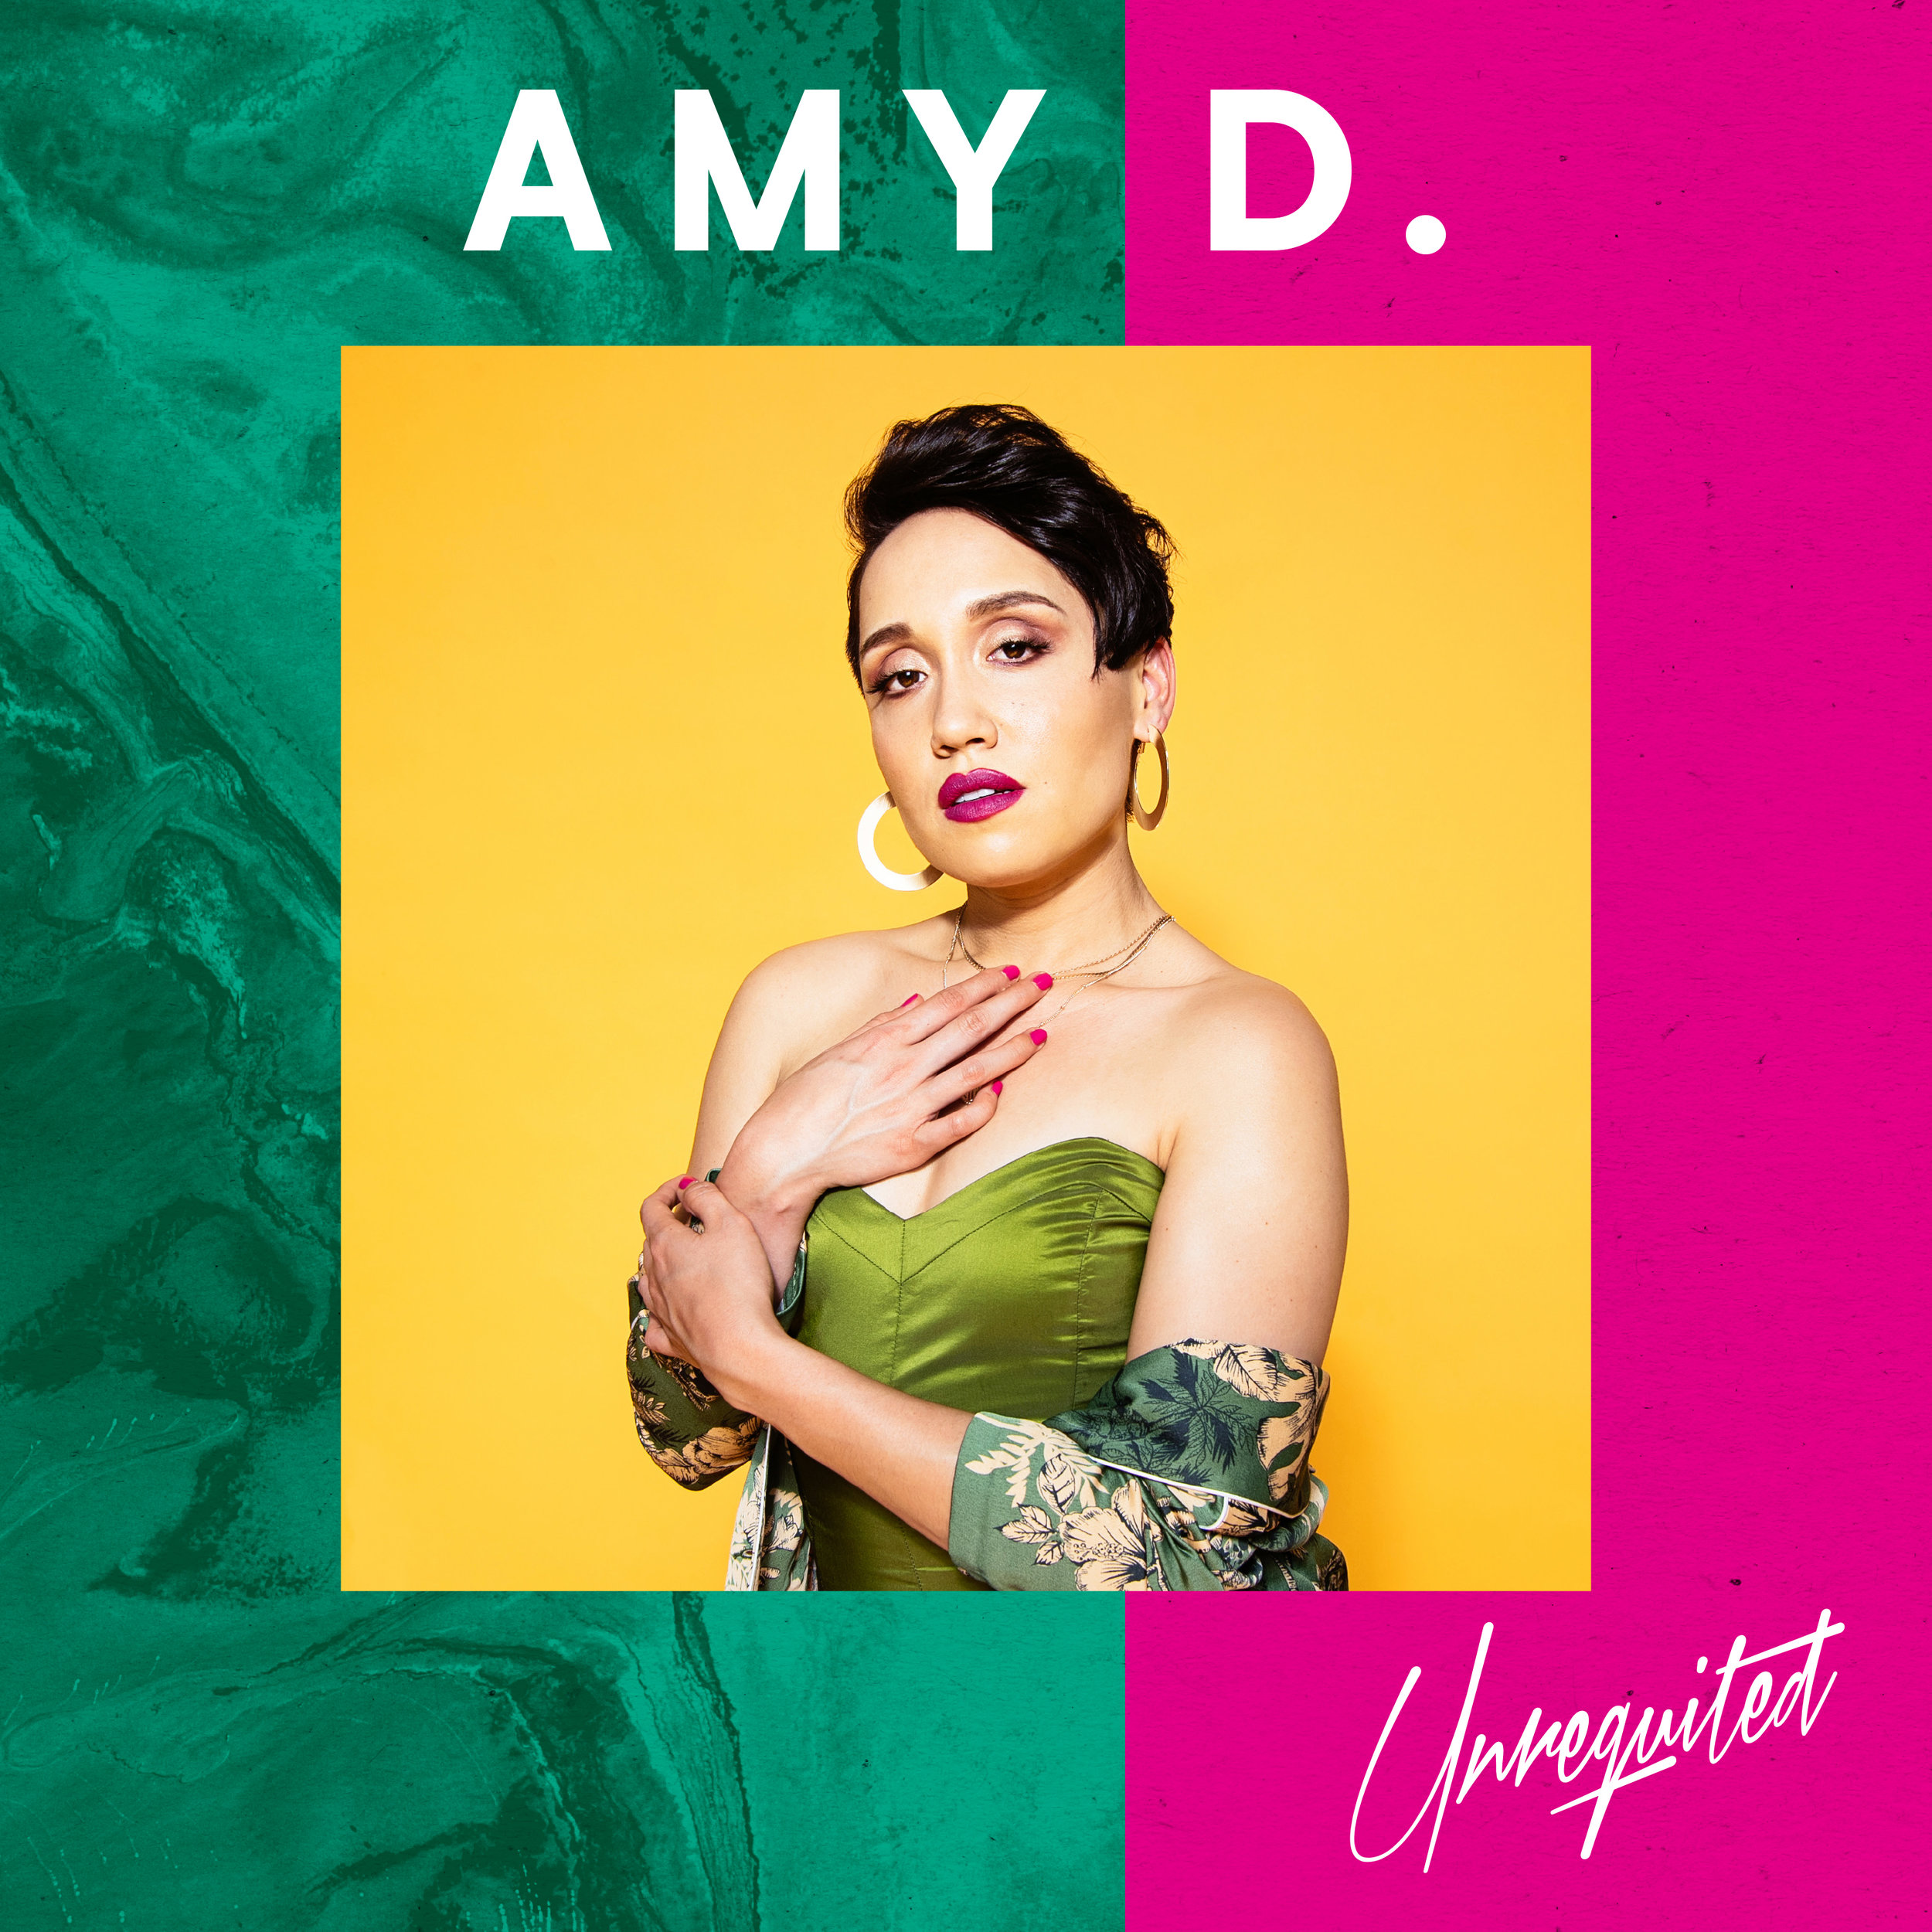 AmyD-UnrequitedSingleCover (1).jpg